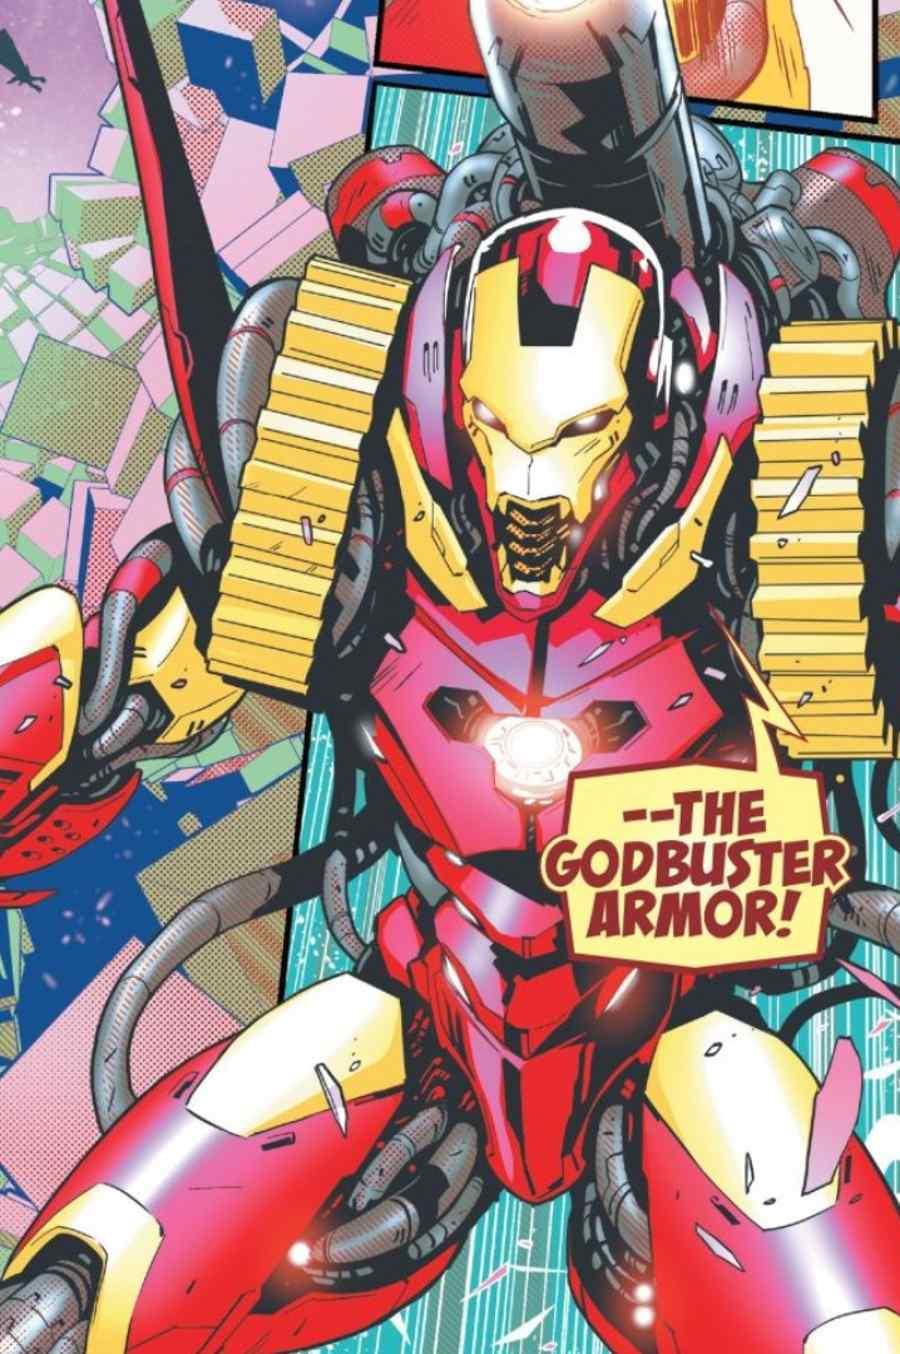 Iron Man godbuster armor